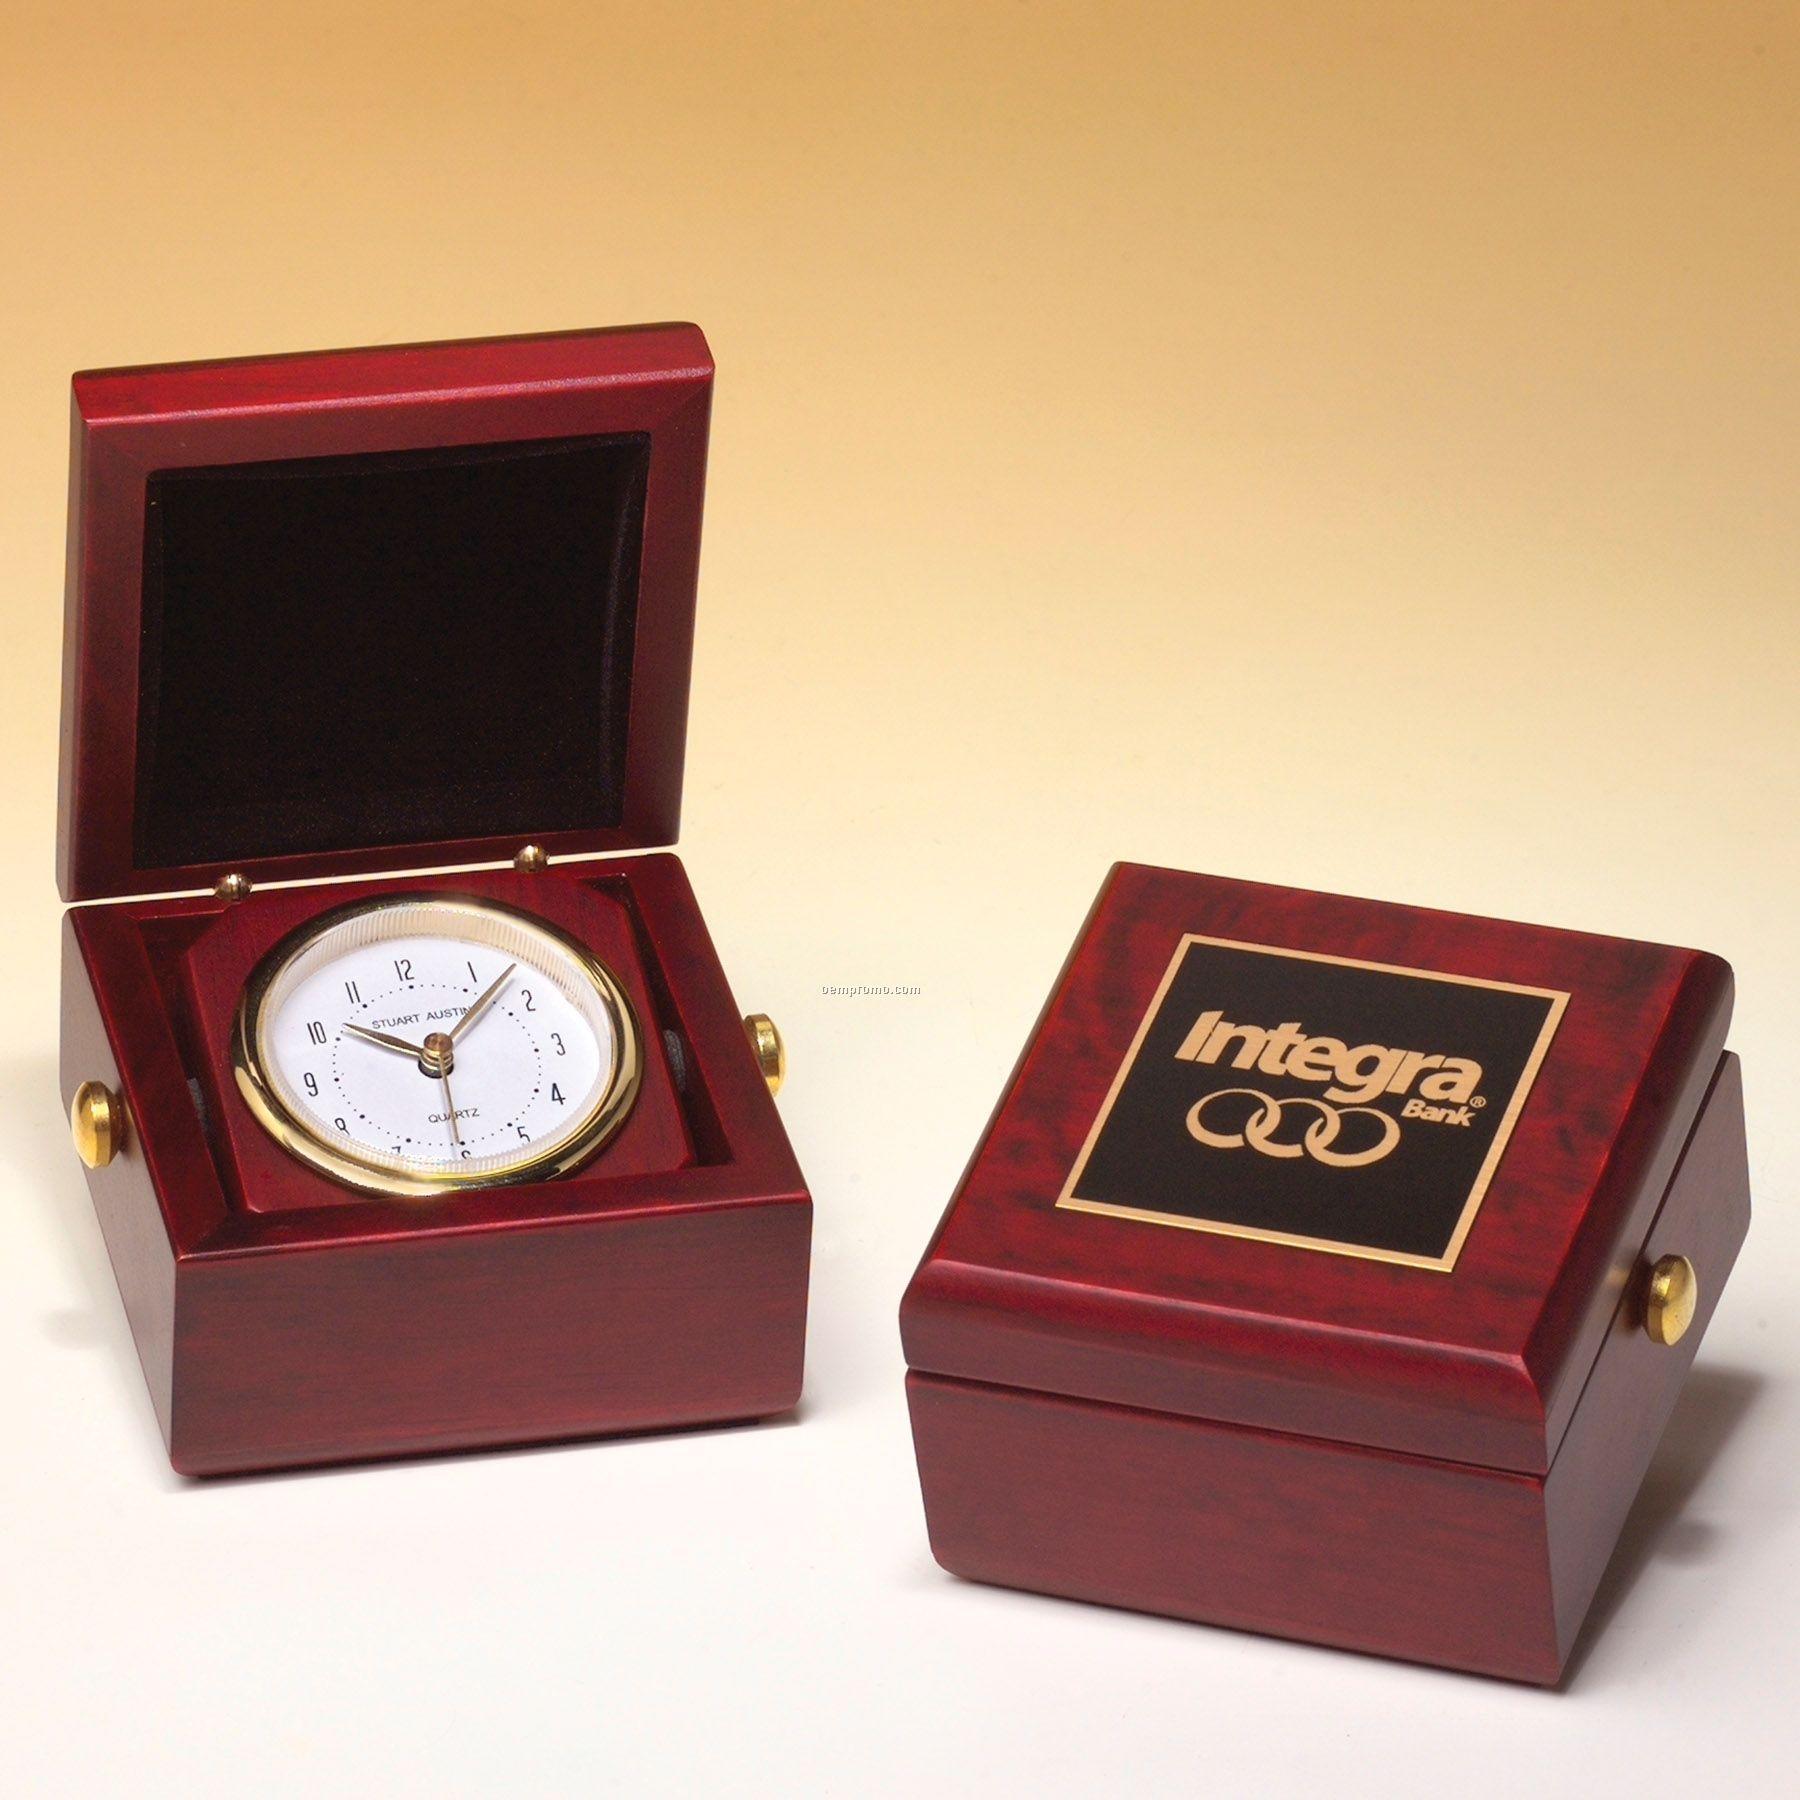 Miniature Captain's Desk Clock